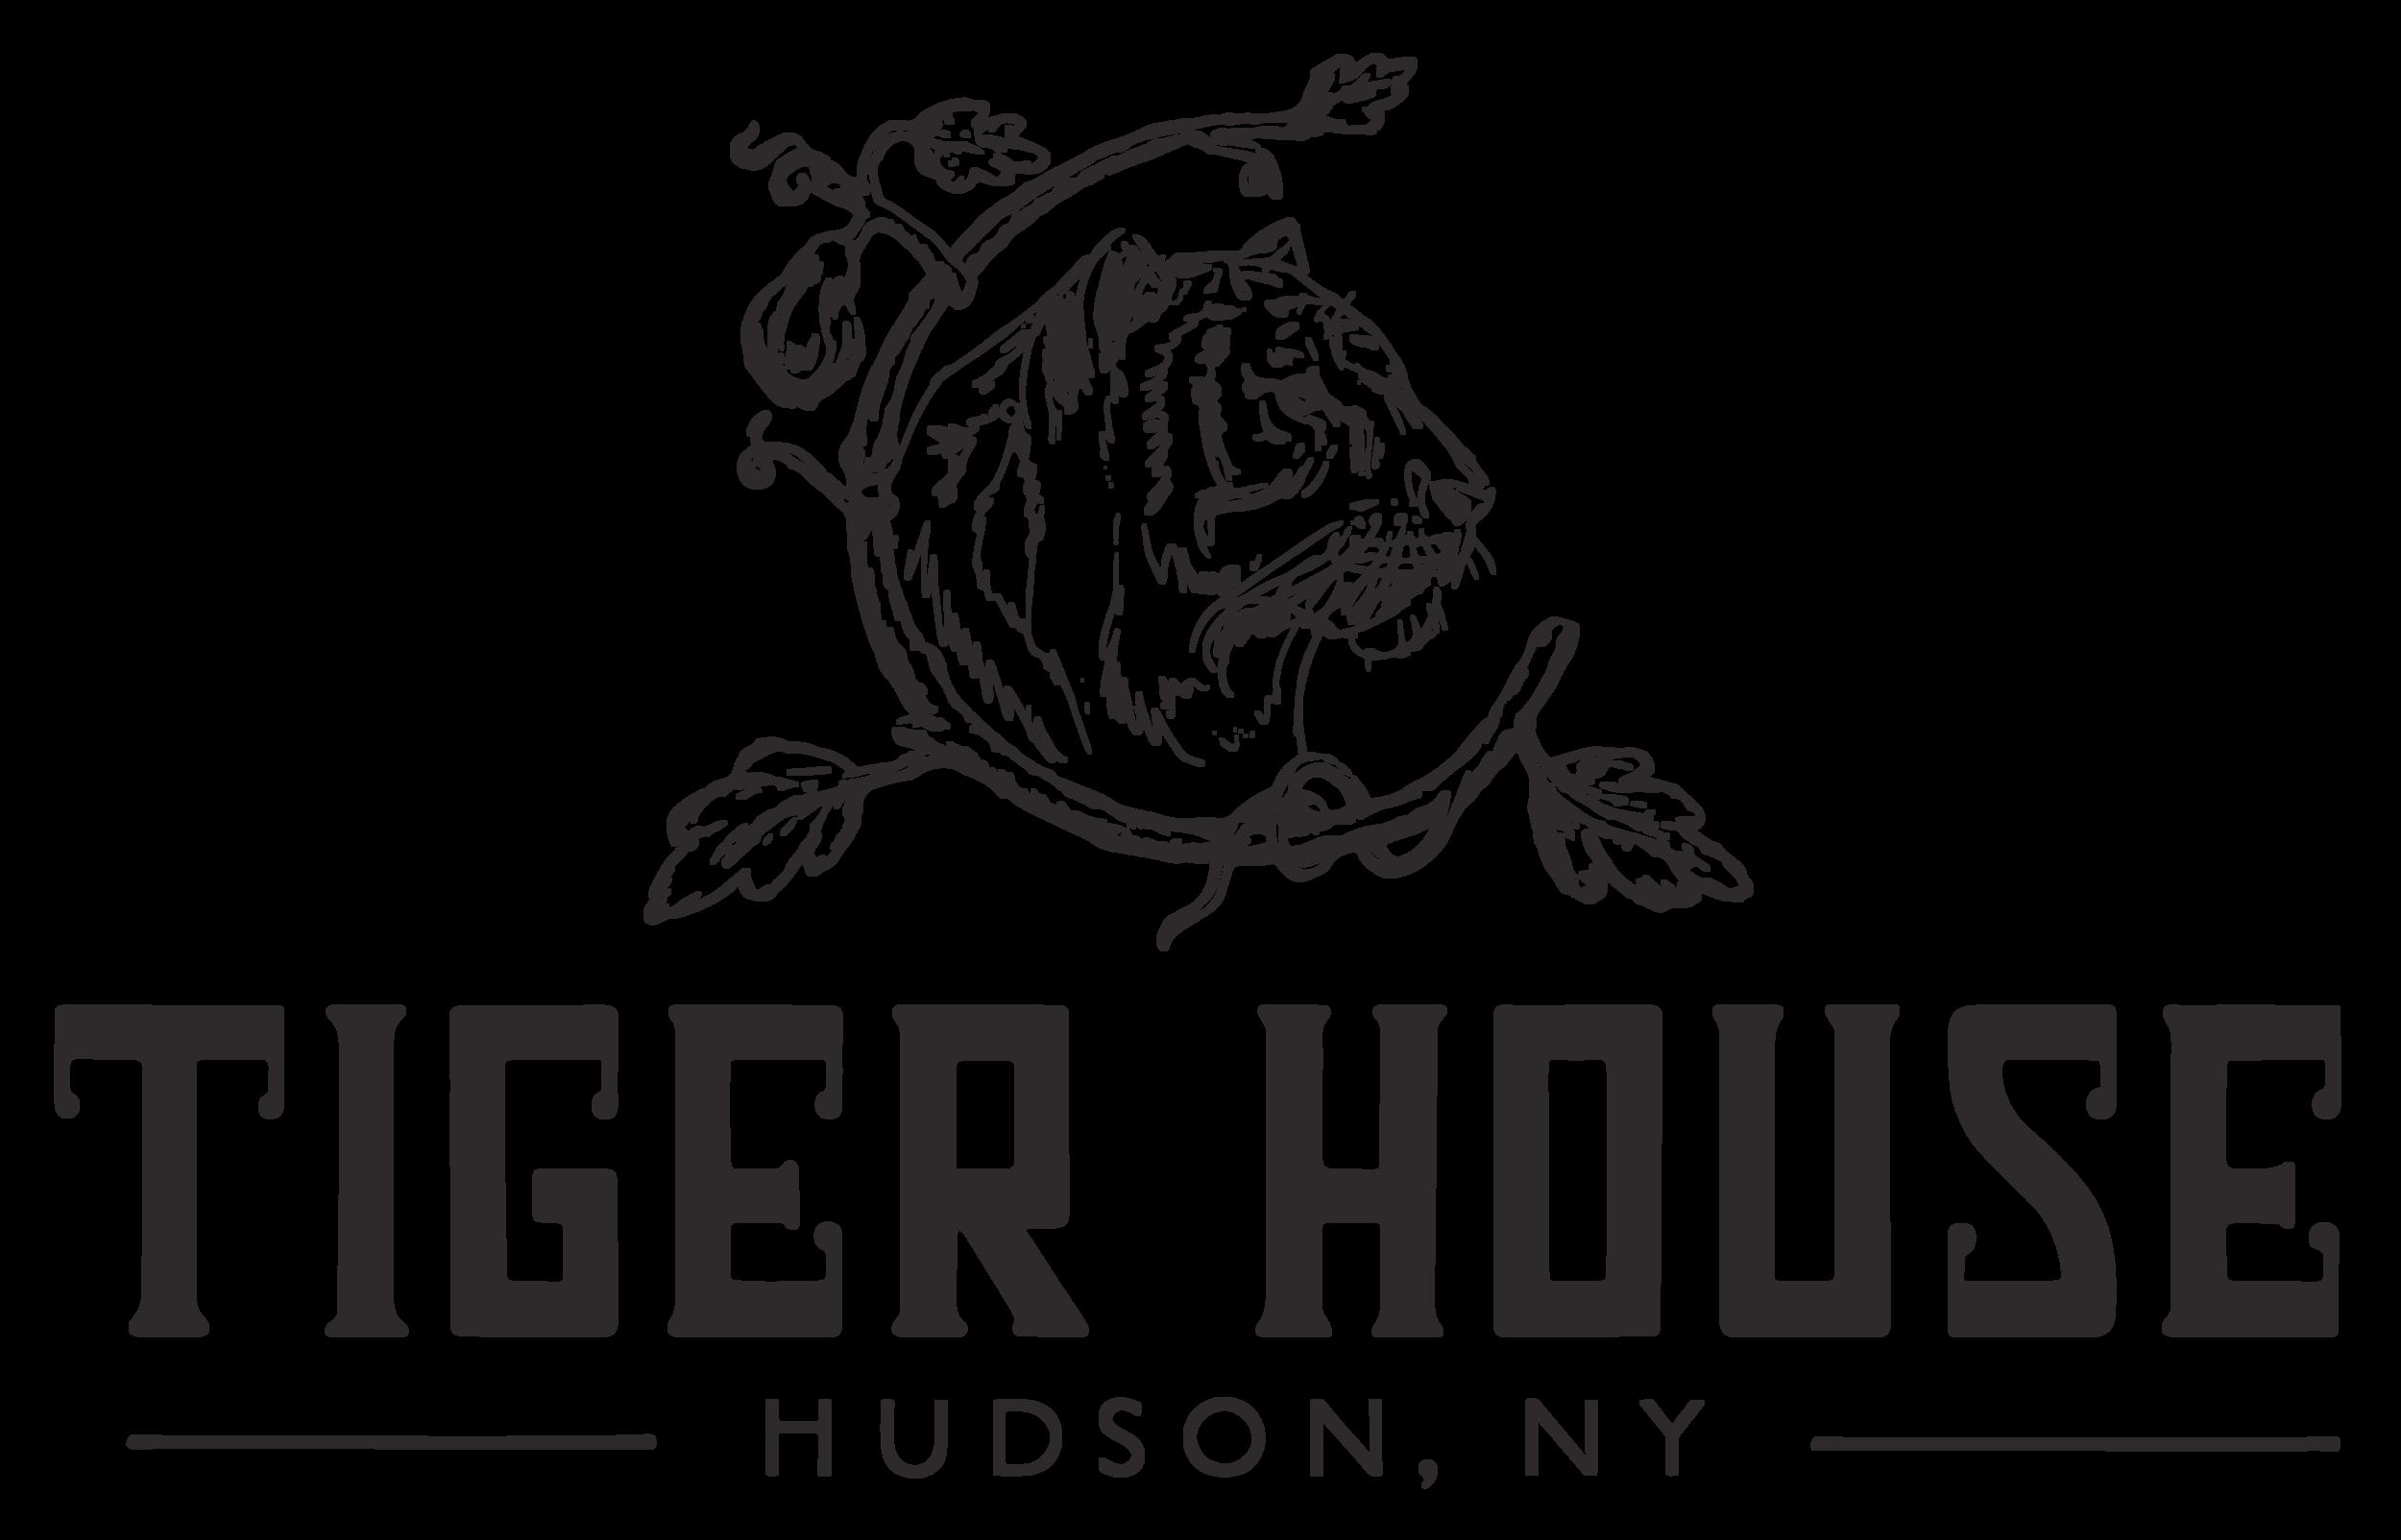 Tiger House - Secondary logo (rgb:web) - Horizontal - B&W - Transparent background.png